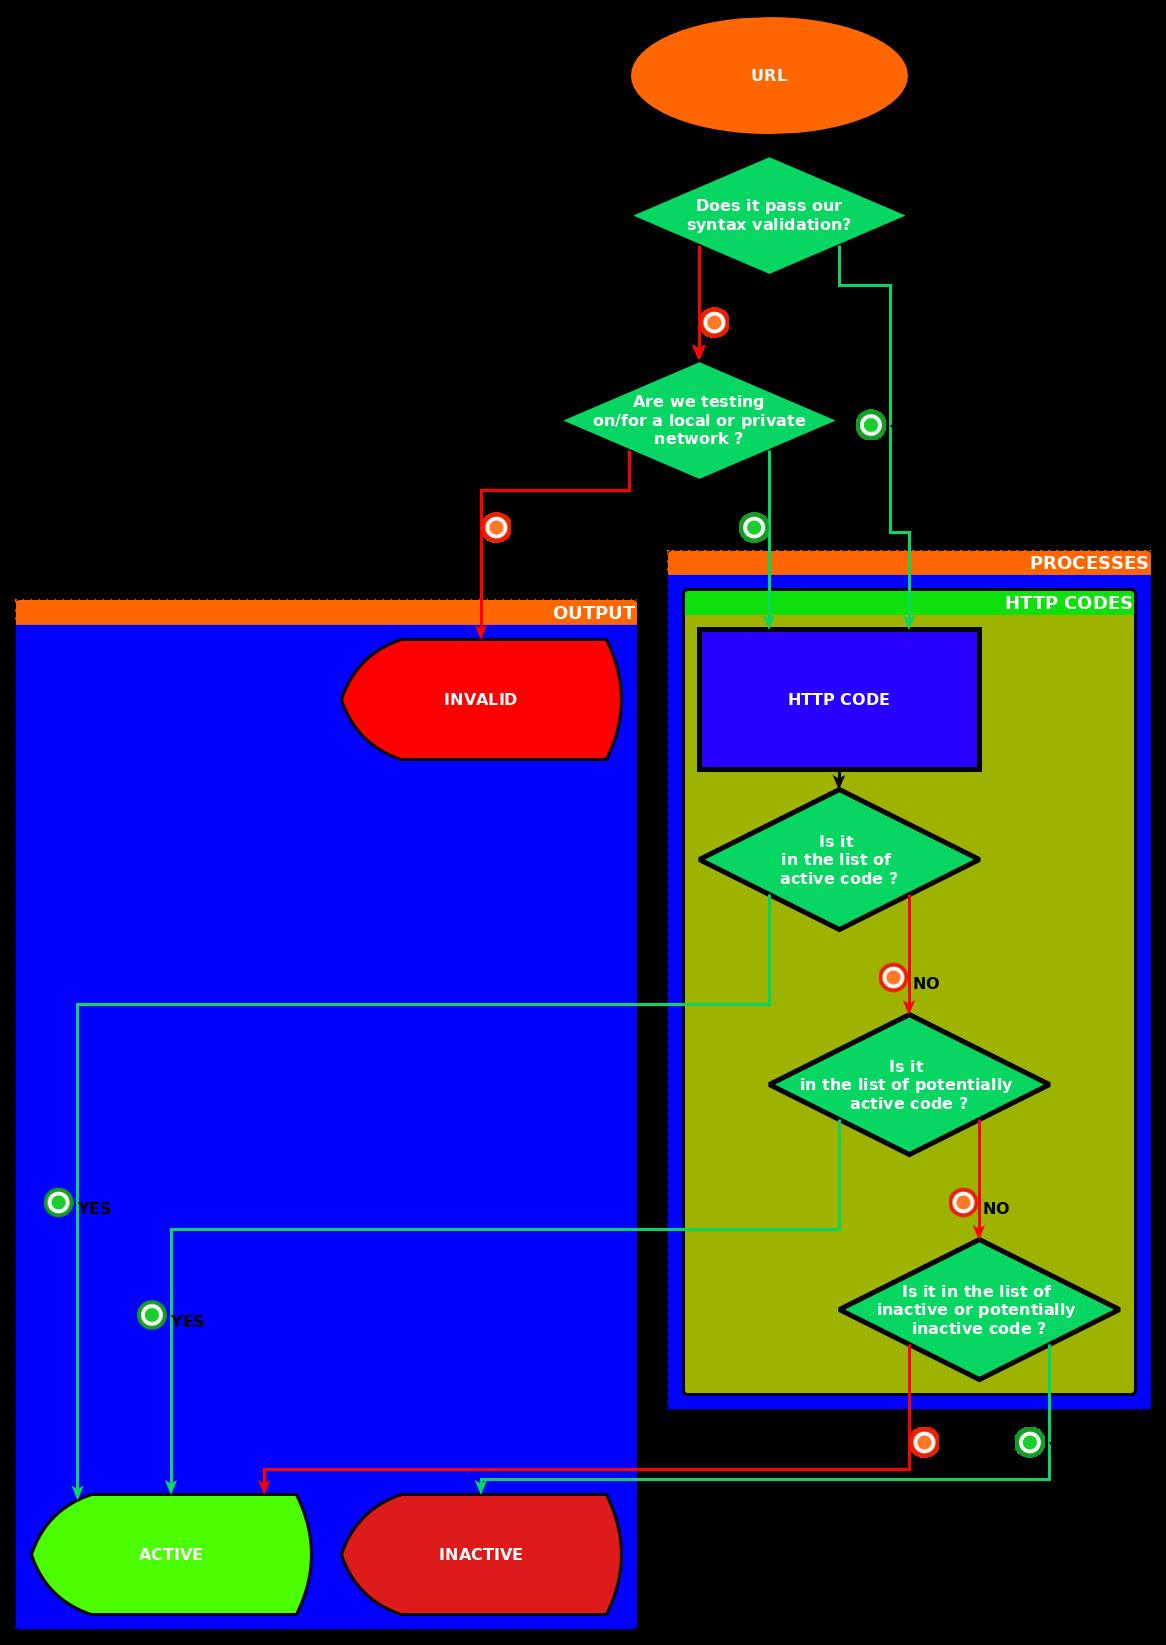 PyFunceble Logic representation for URL testing